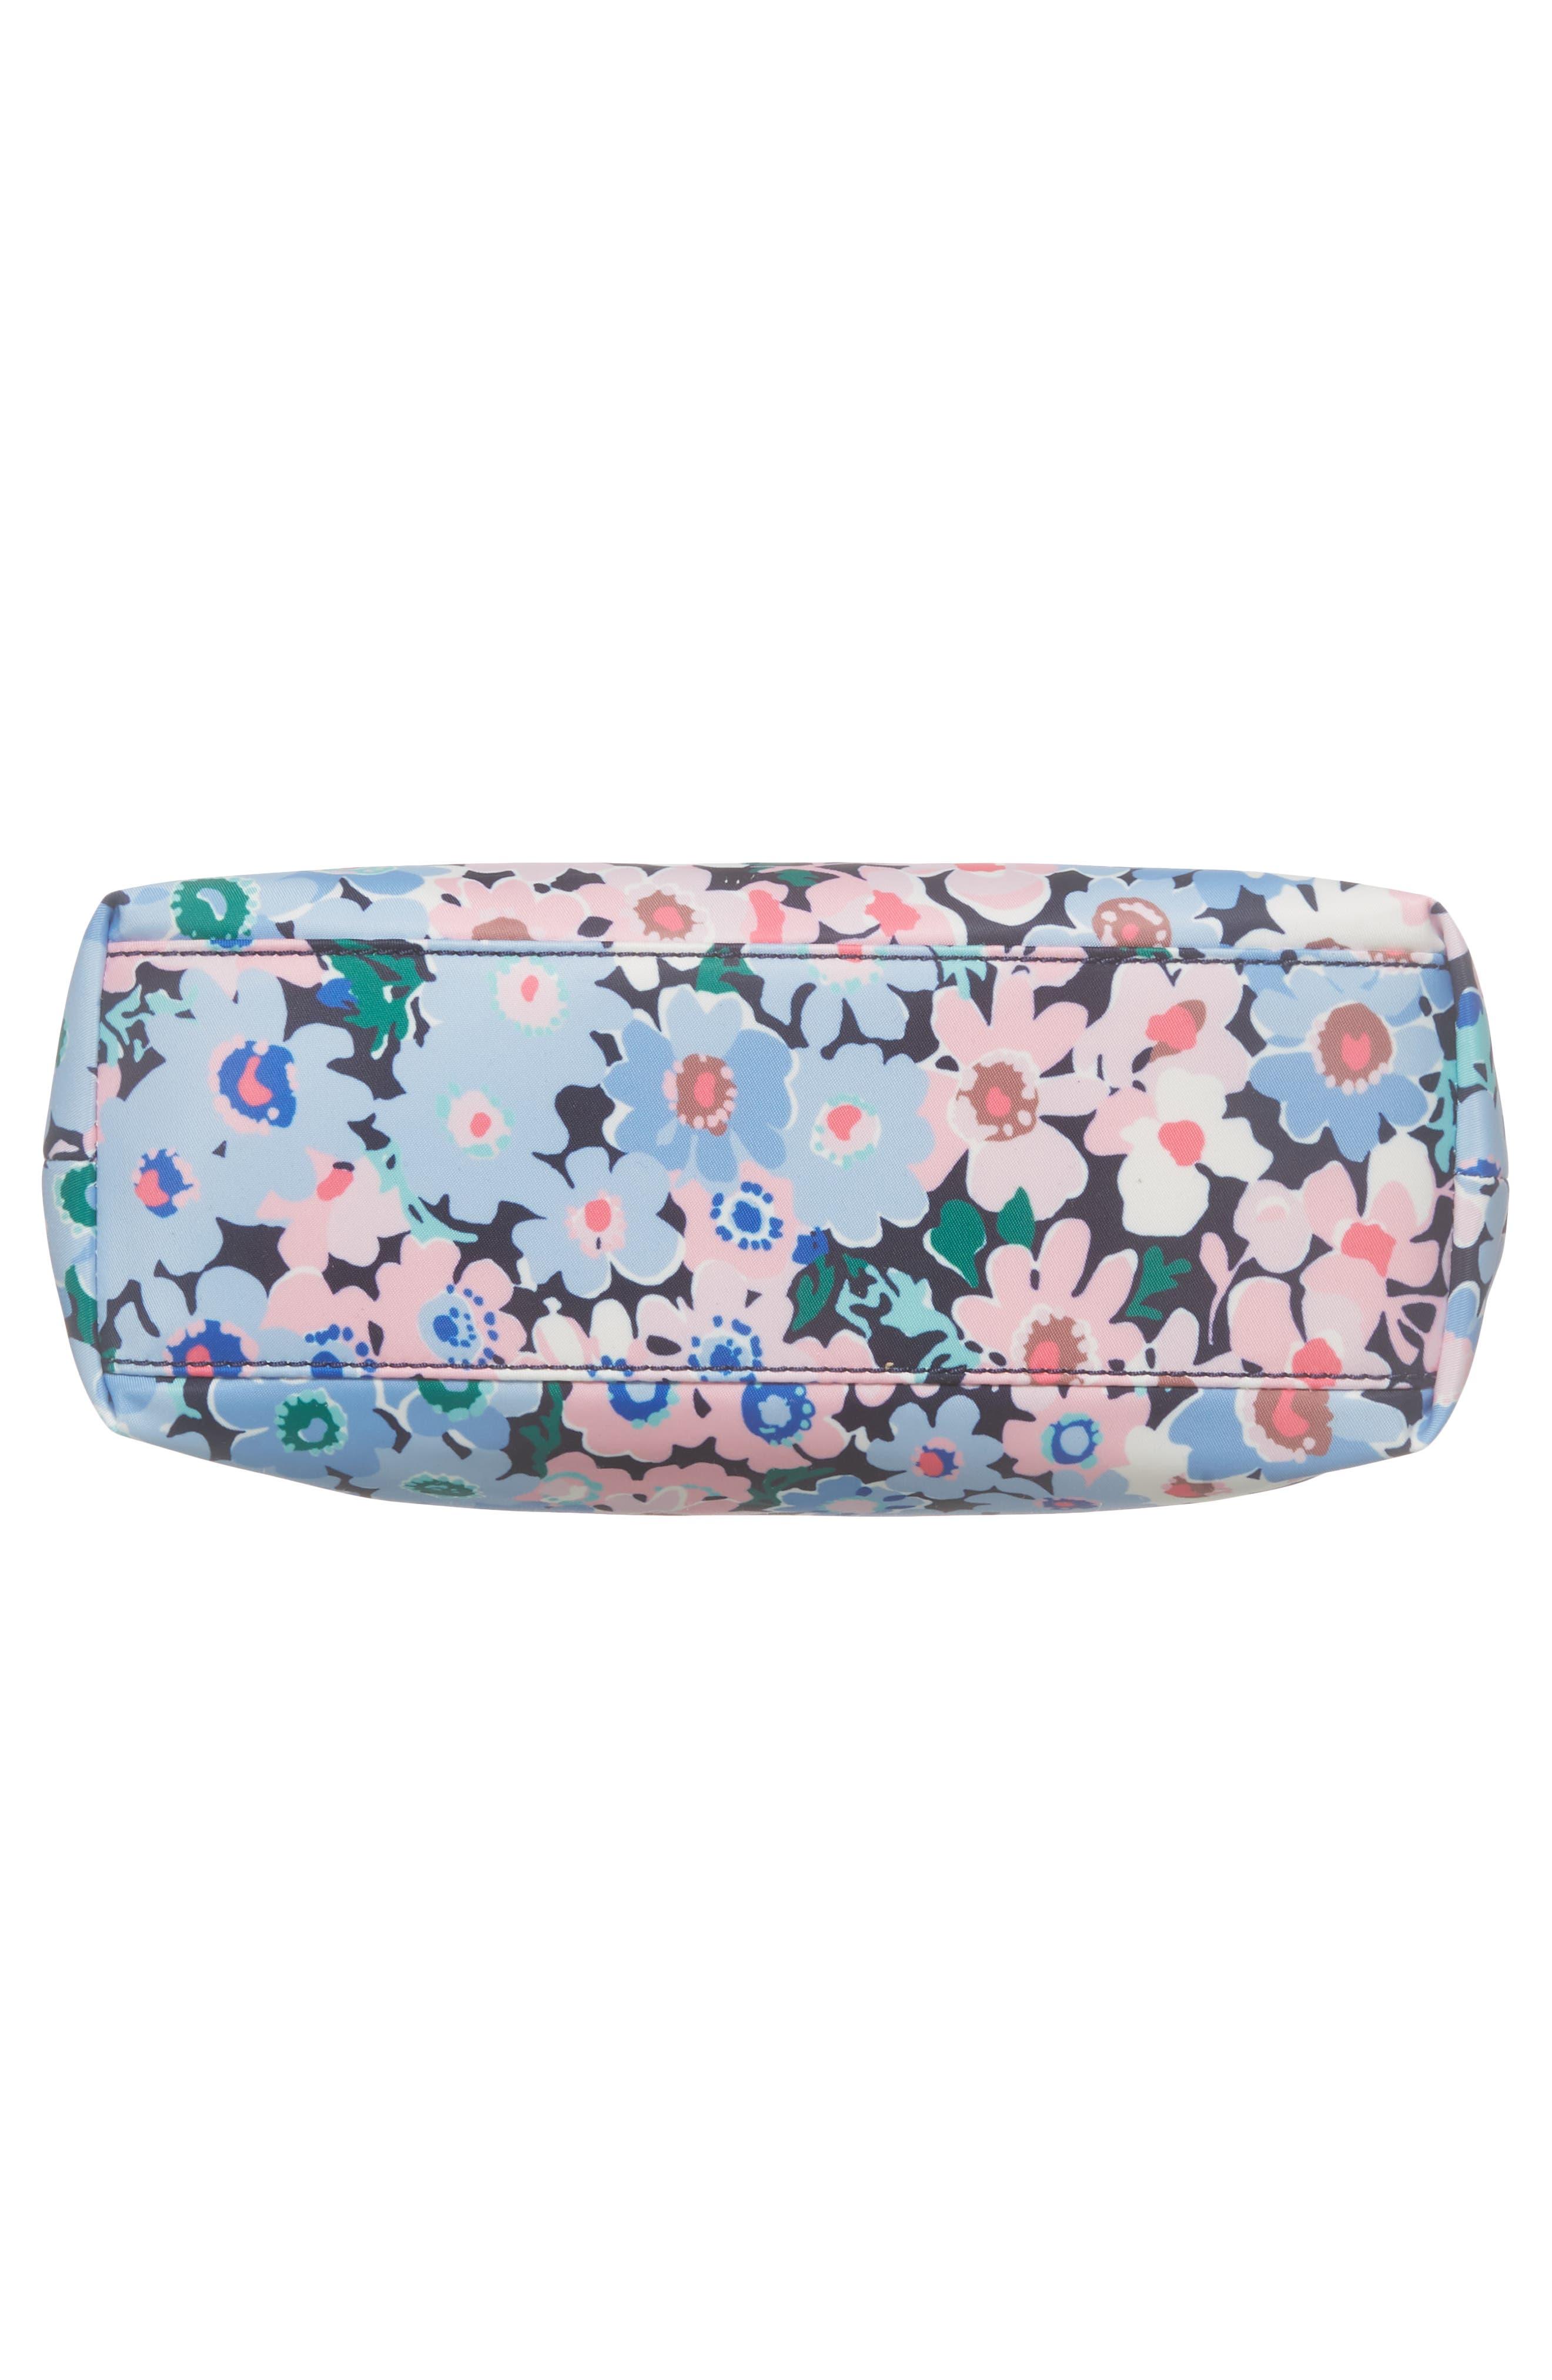 watson lane - daisy garden lucie crossbody bag,                             Alternate thumbnail 6, color,                             Blue Multi